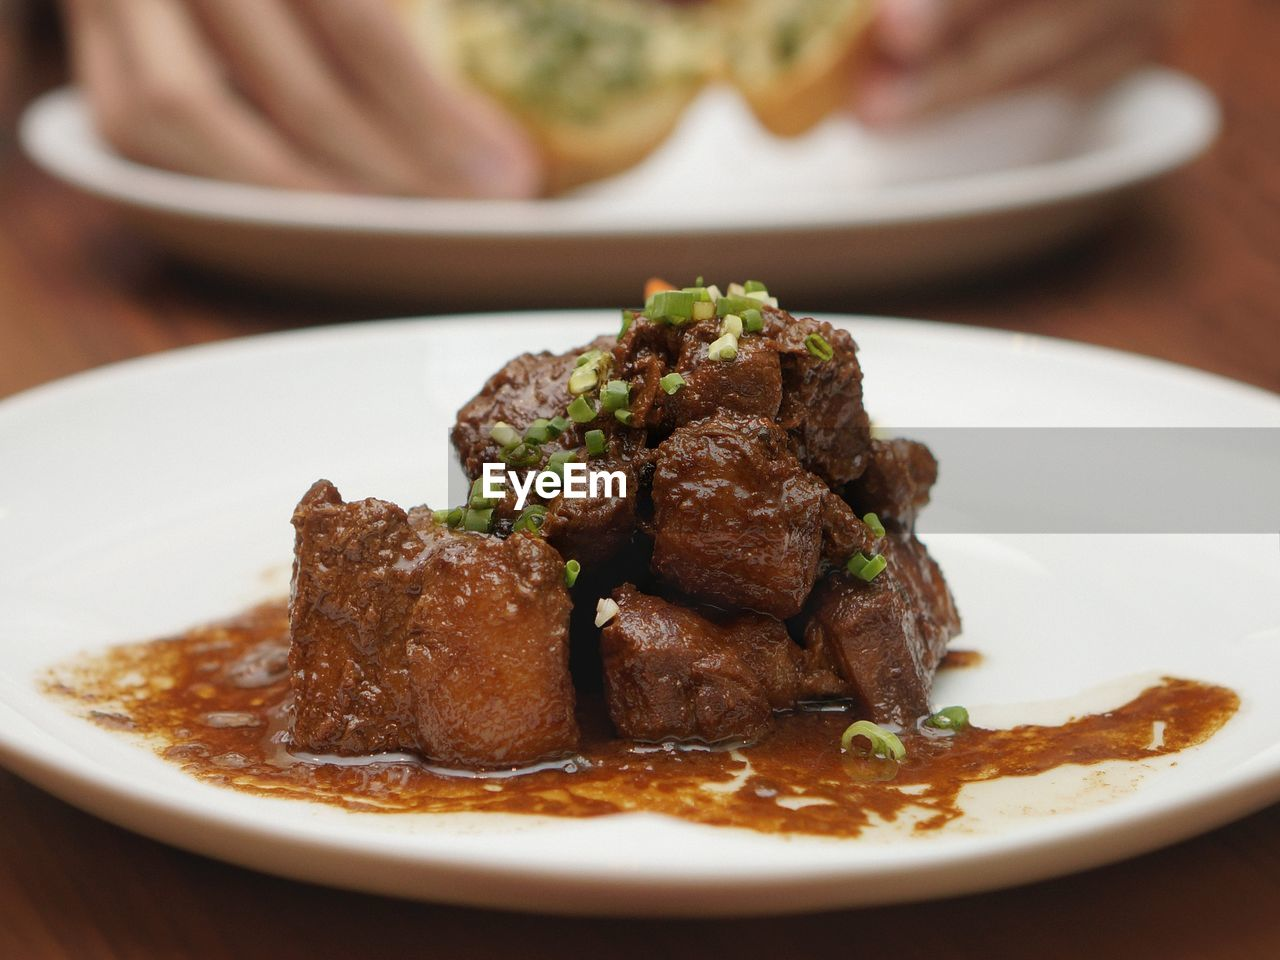 Plated Pork Adobo Filipino Food Pork Adobo | on EyeEm